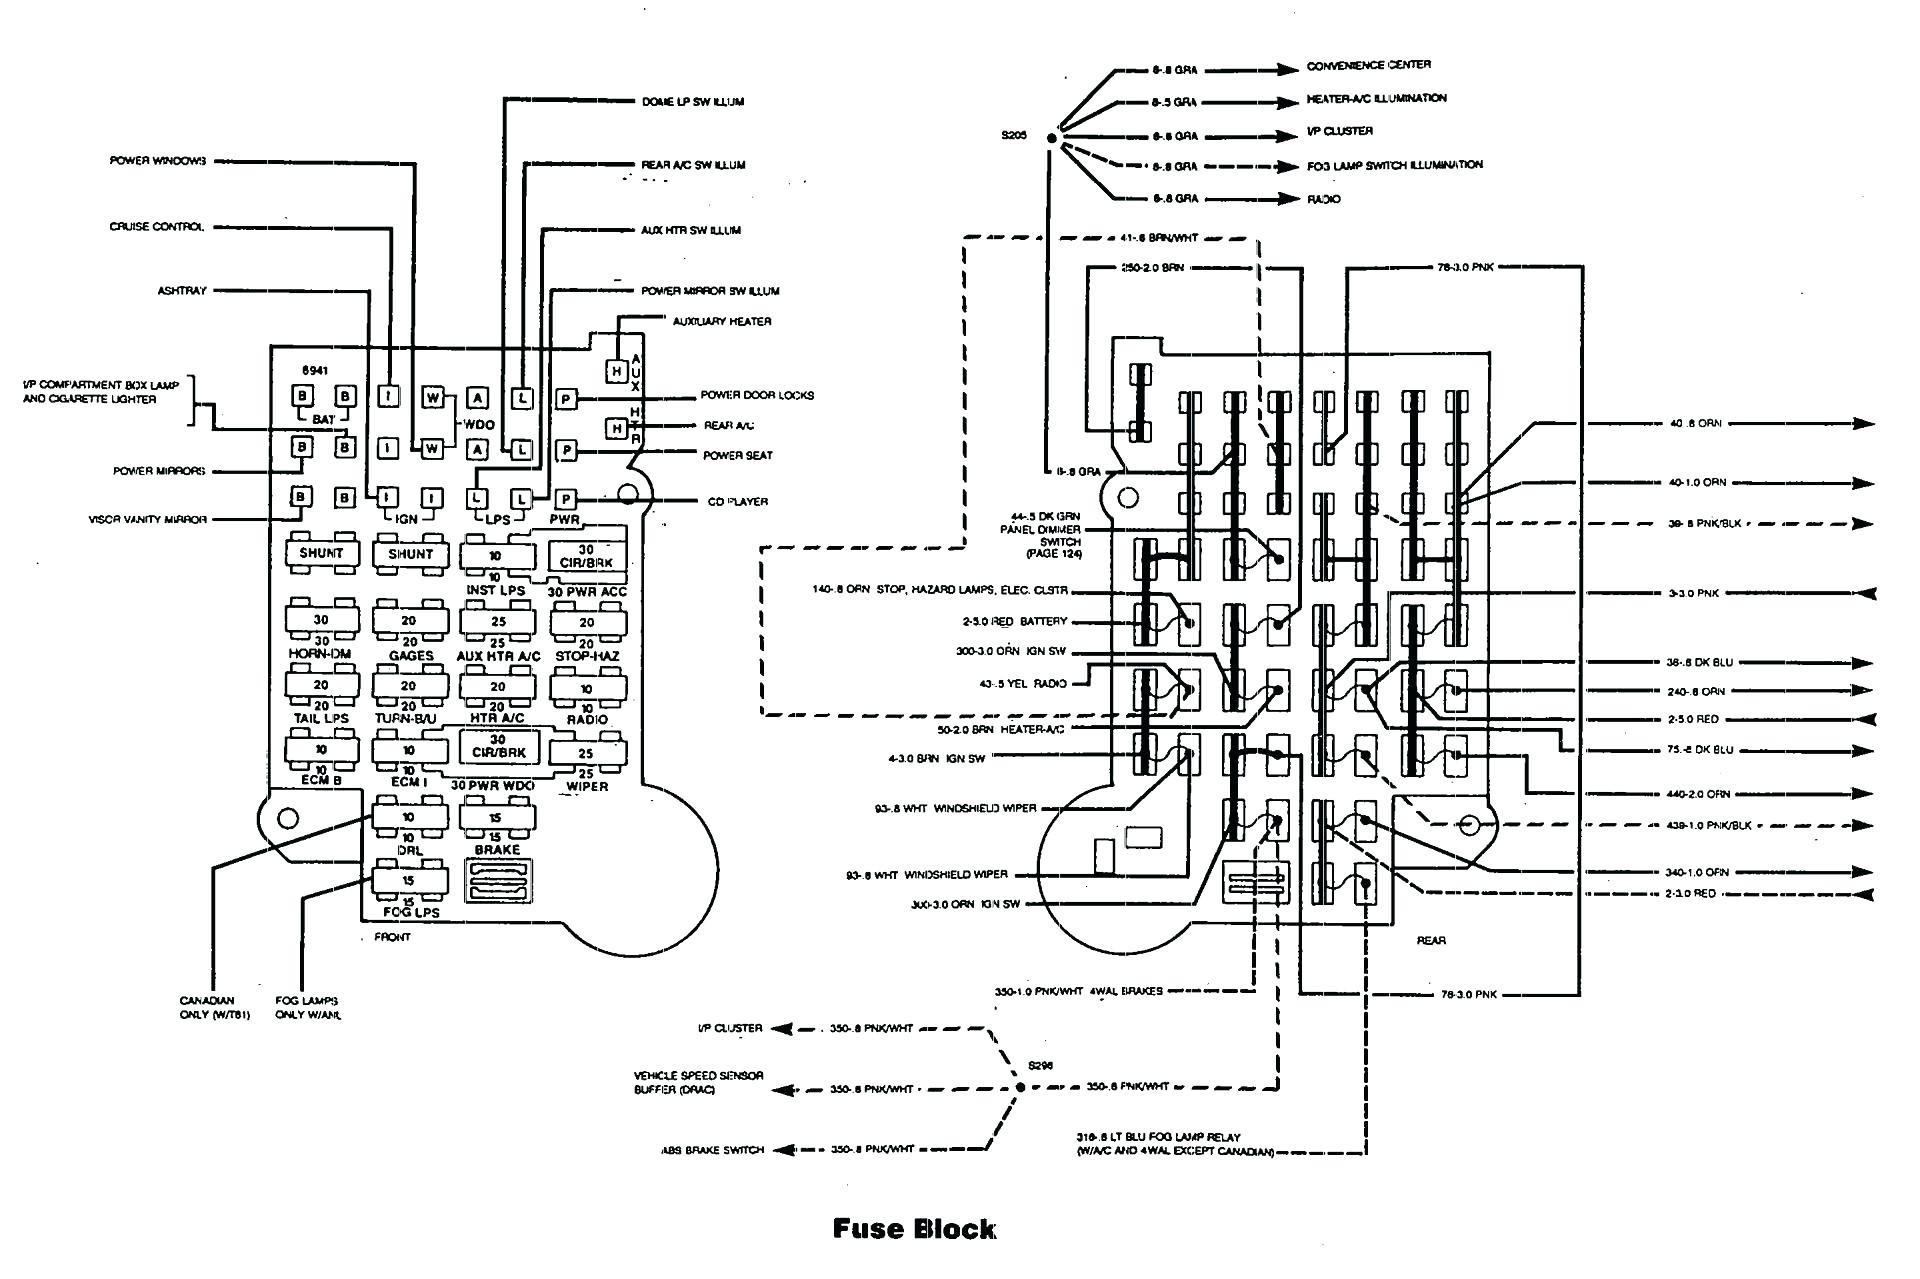 e636d fuse box in mitsubishi eclipse digital resources 2007 mitsubishi eclipse wiring-diagram 99 eclipse coil wiring diagram #14